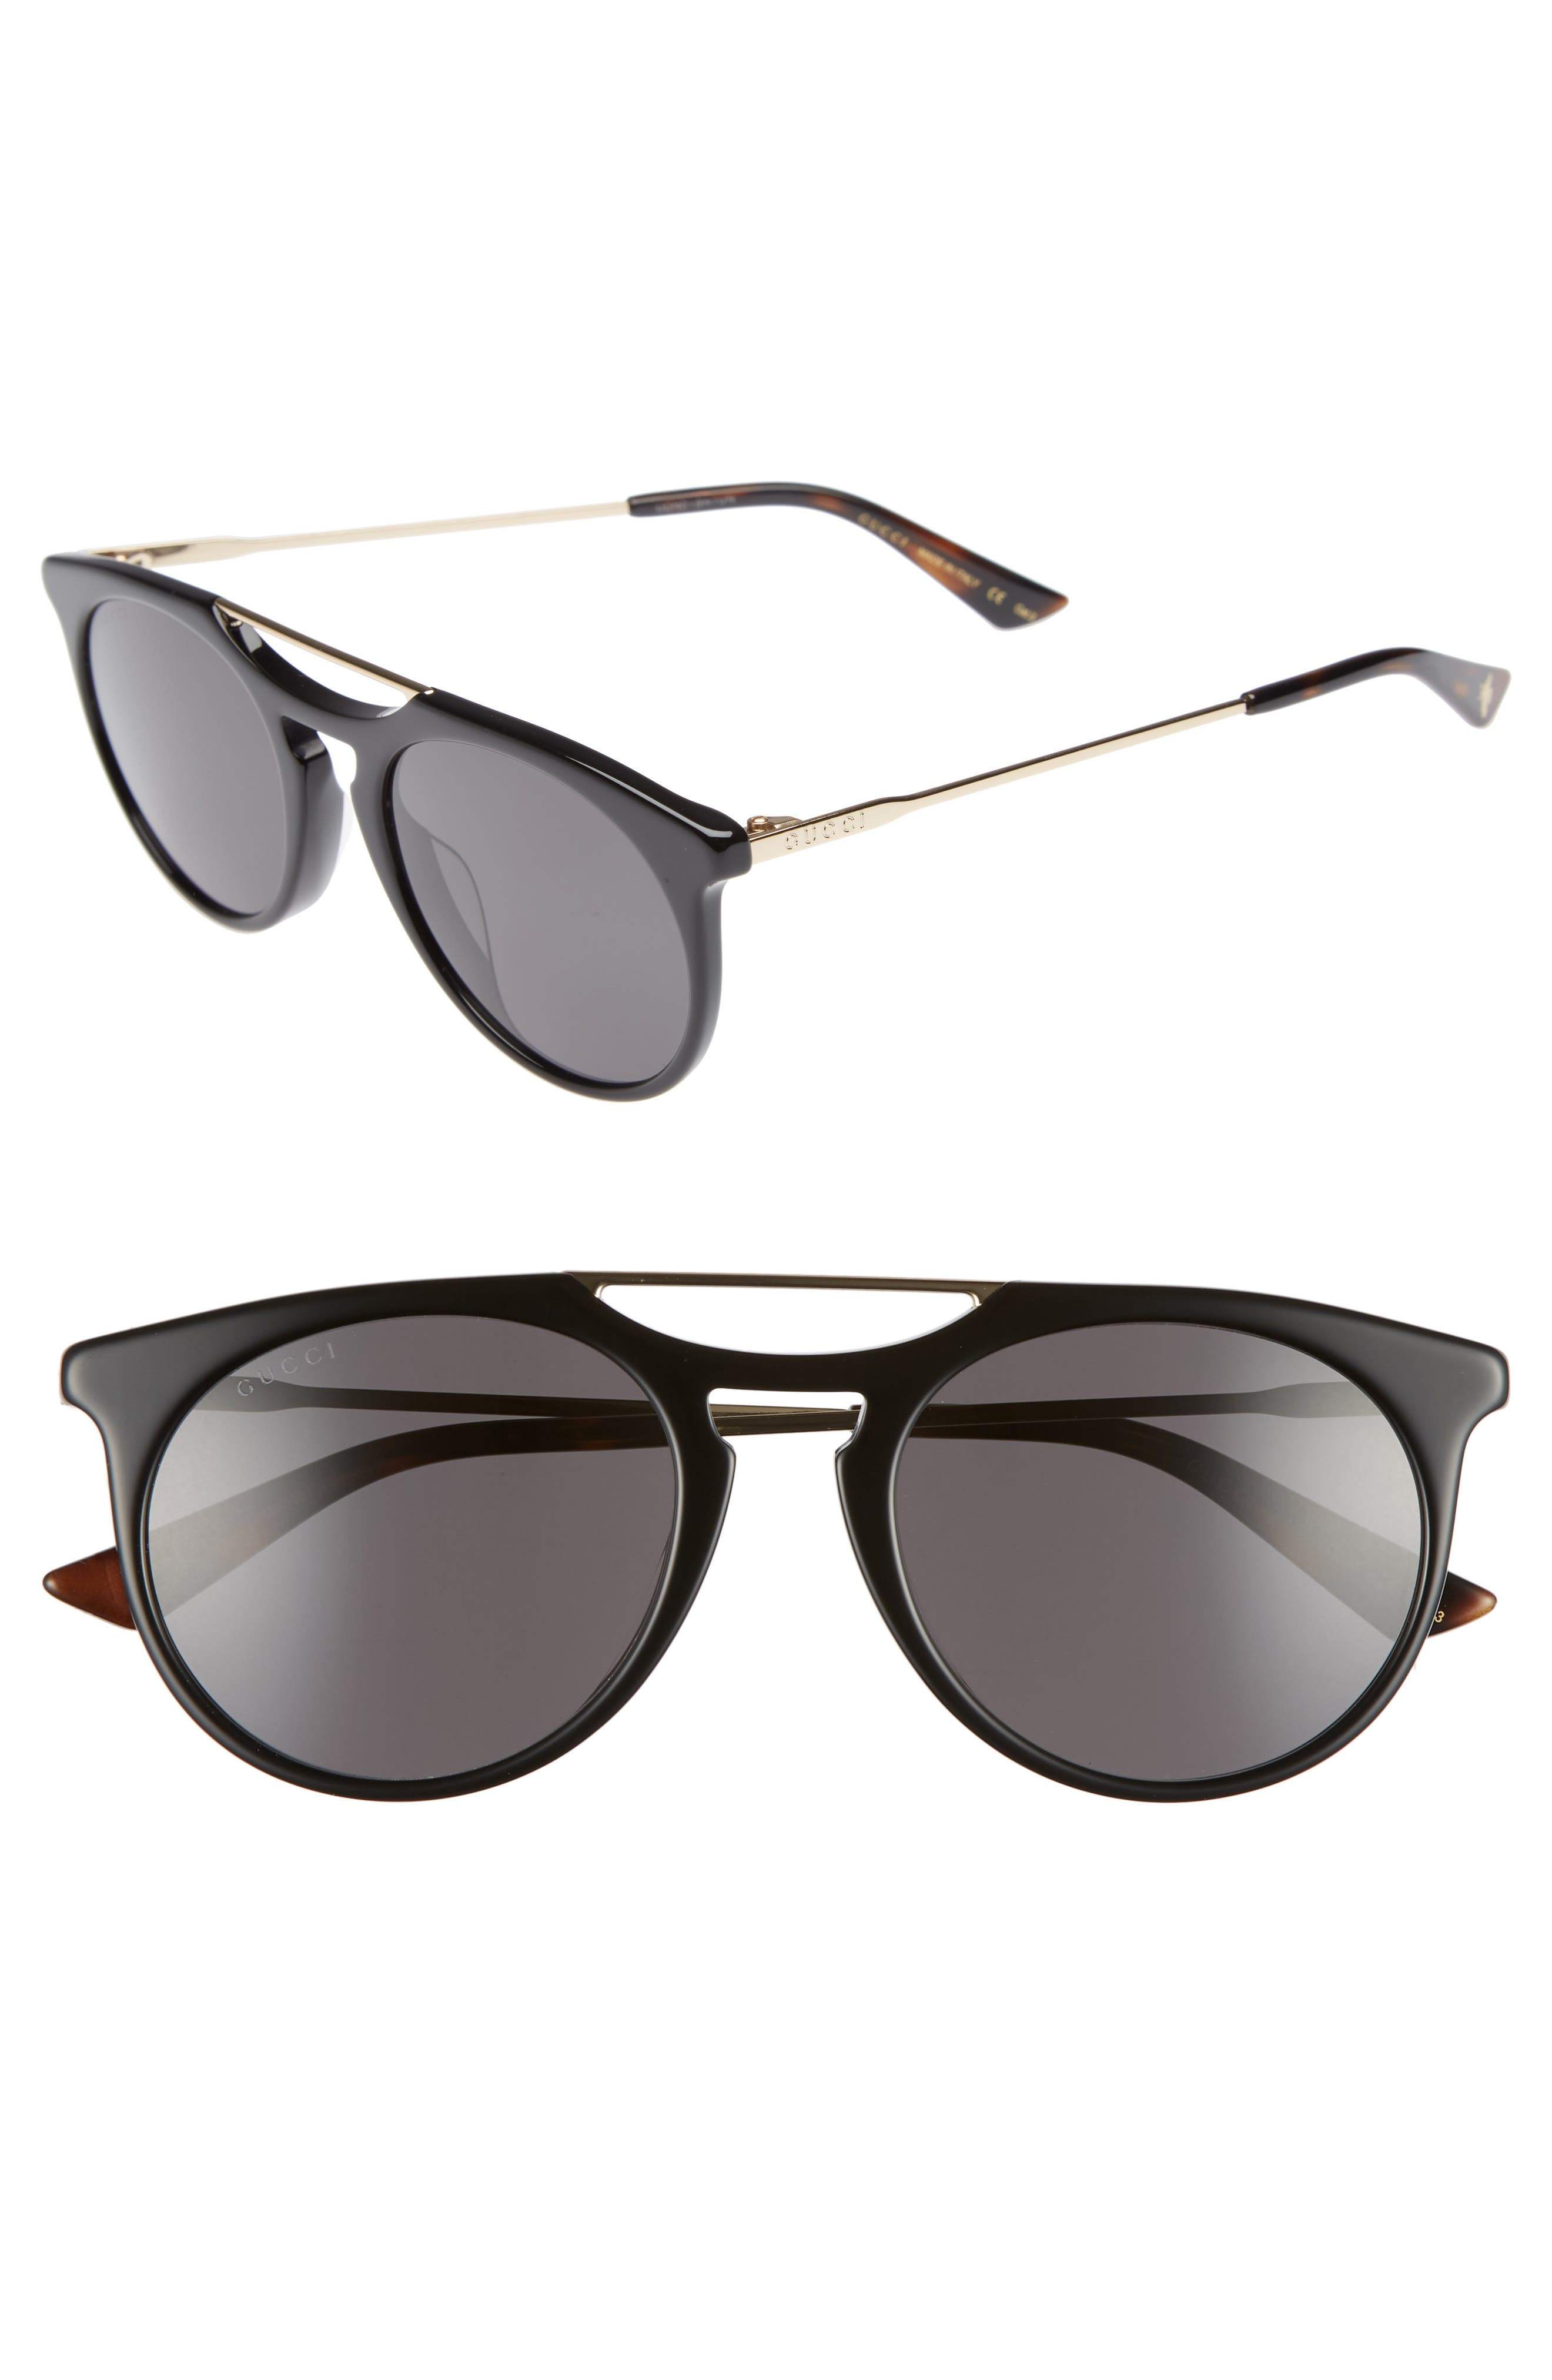 Light Combi 53mm Sunglasses,                             Main thumbnail 1, color,                             Gold/ Dark Havana